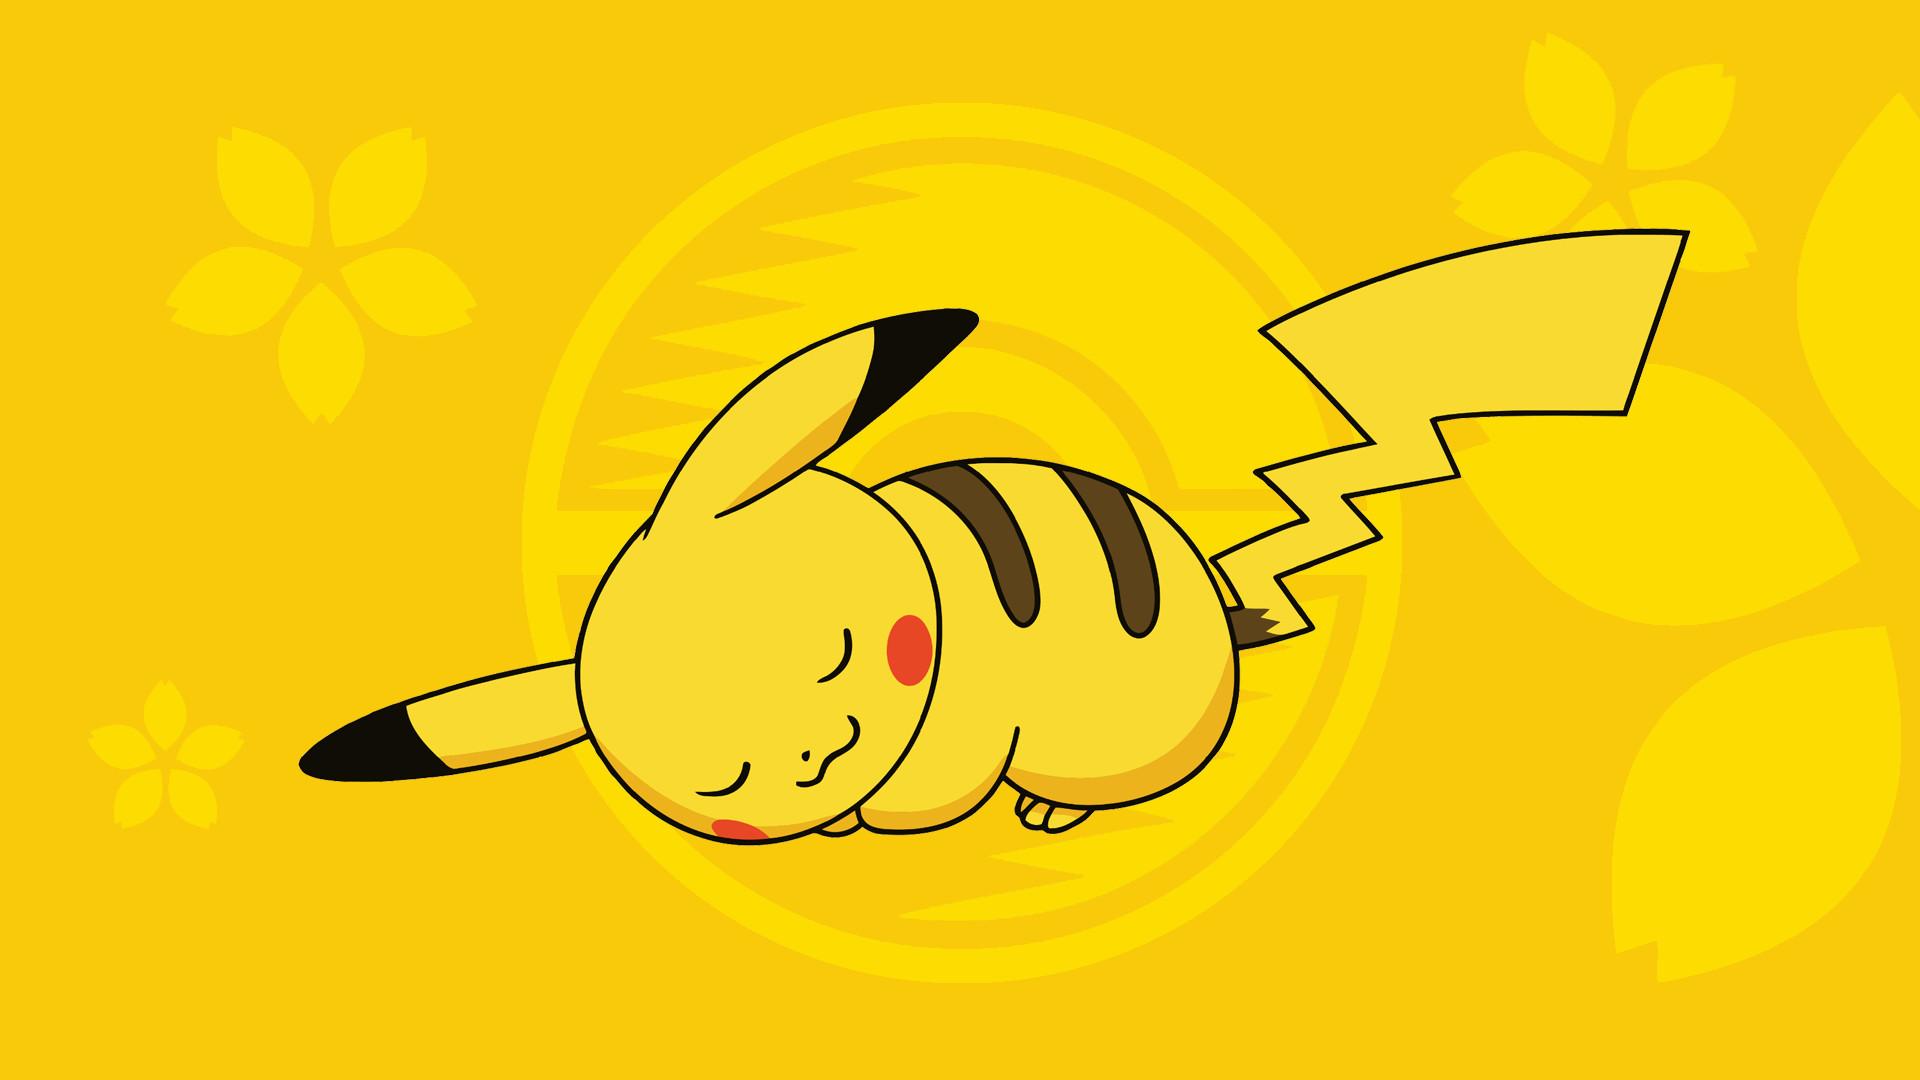 Cute Pikachu HD Images